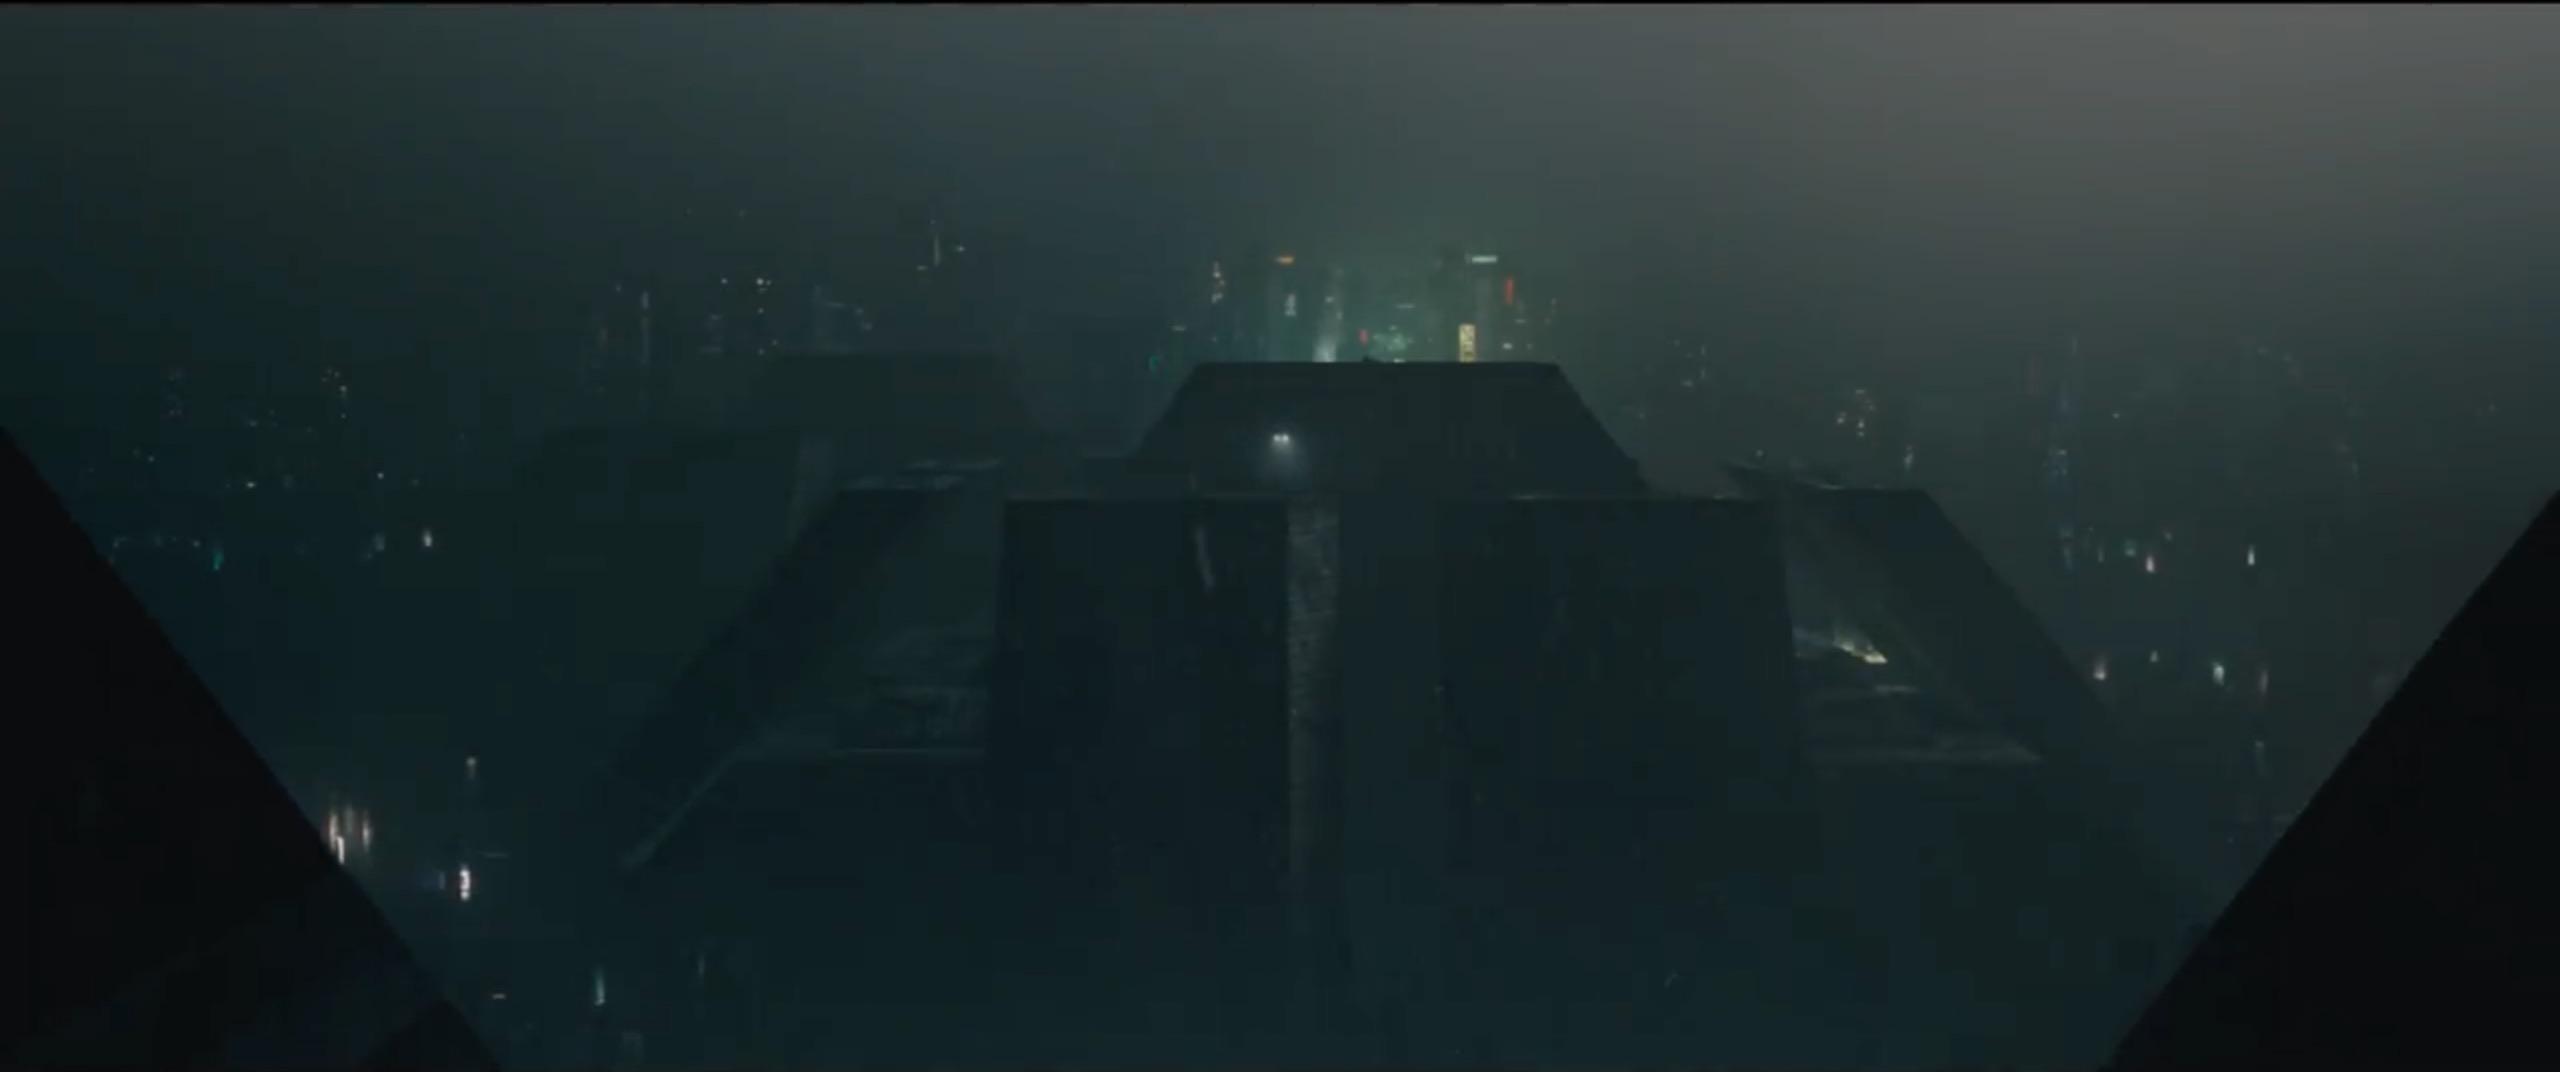 Blade Runner 2049 Trailer Breakdown: What You Missed - photo#30